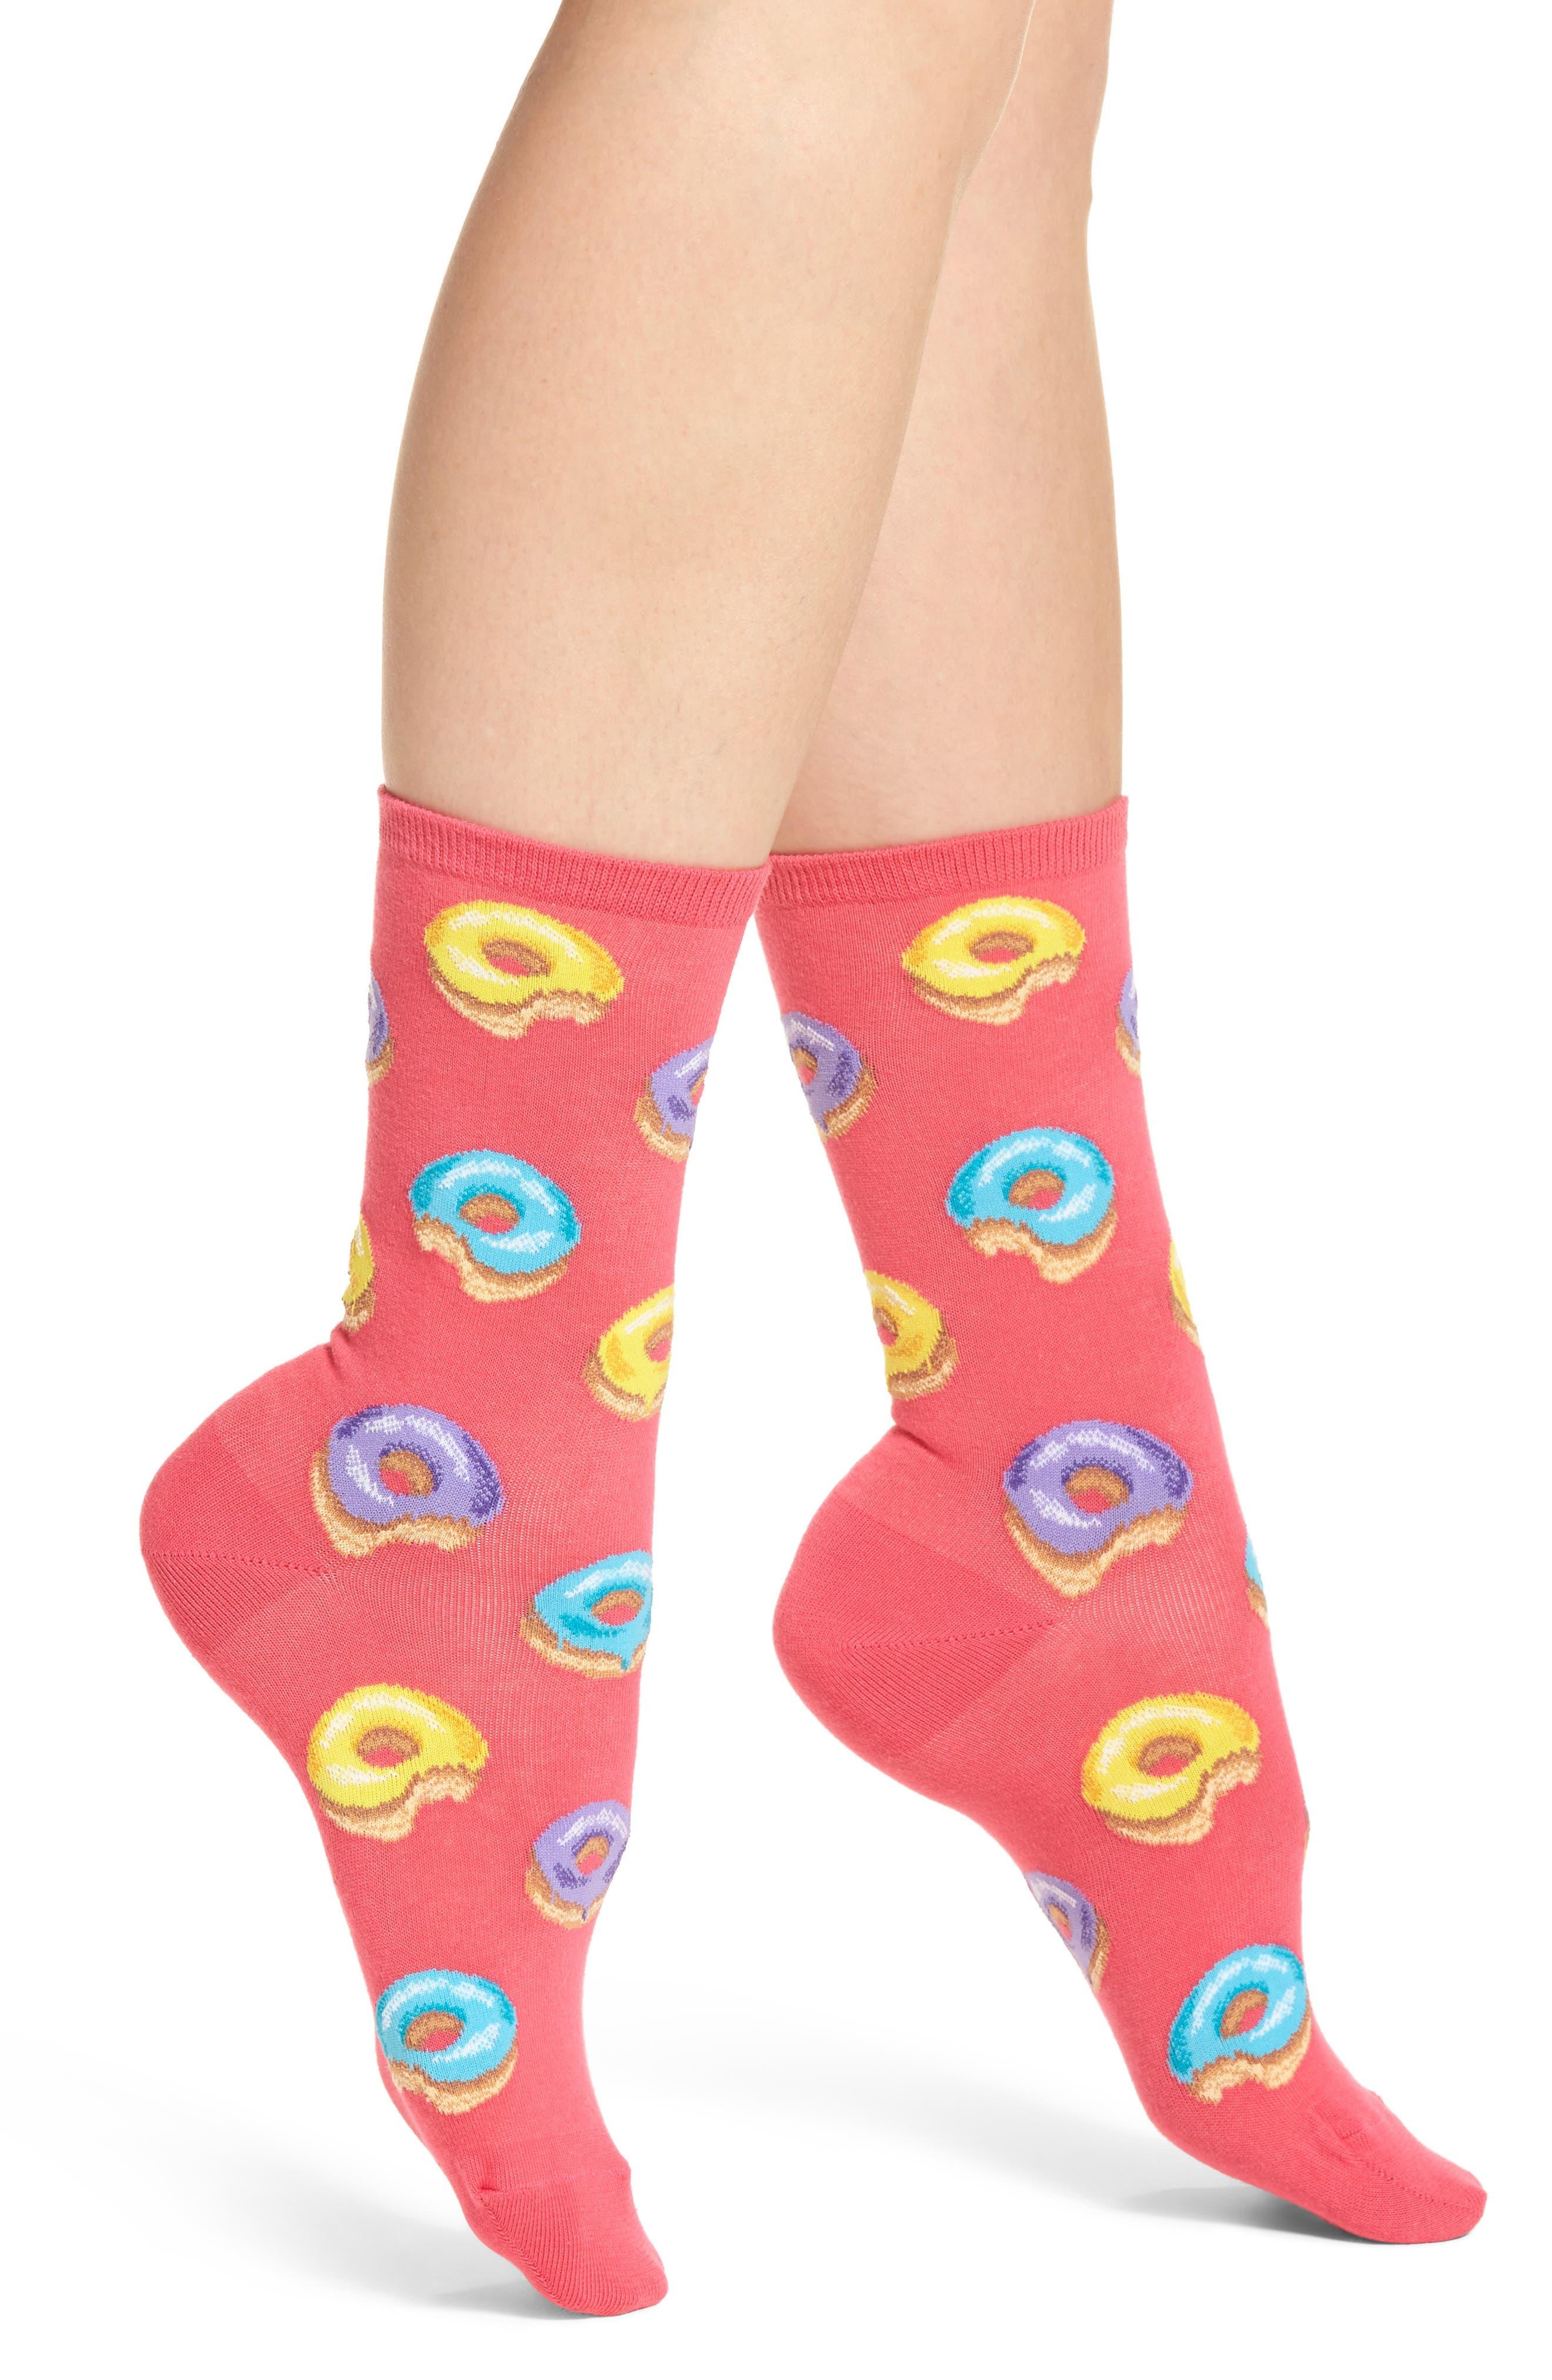 Hot Sox Donuts Crew Socks (3 for $15)